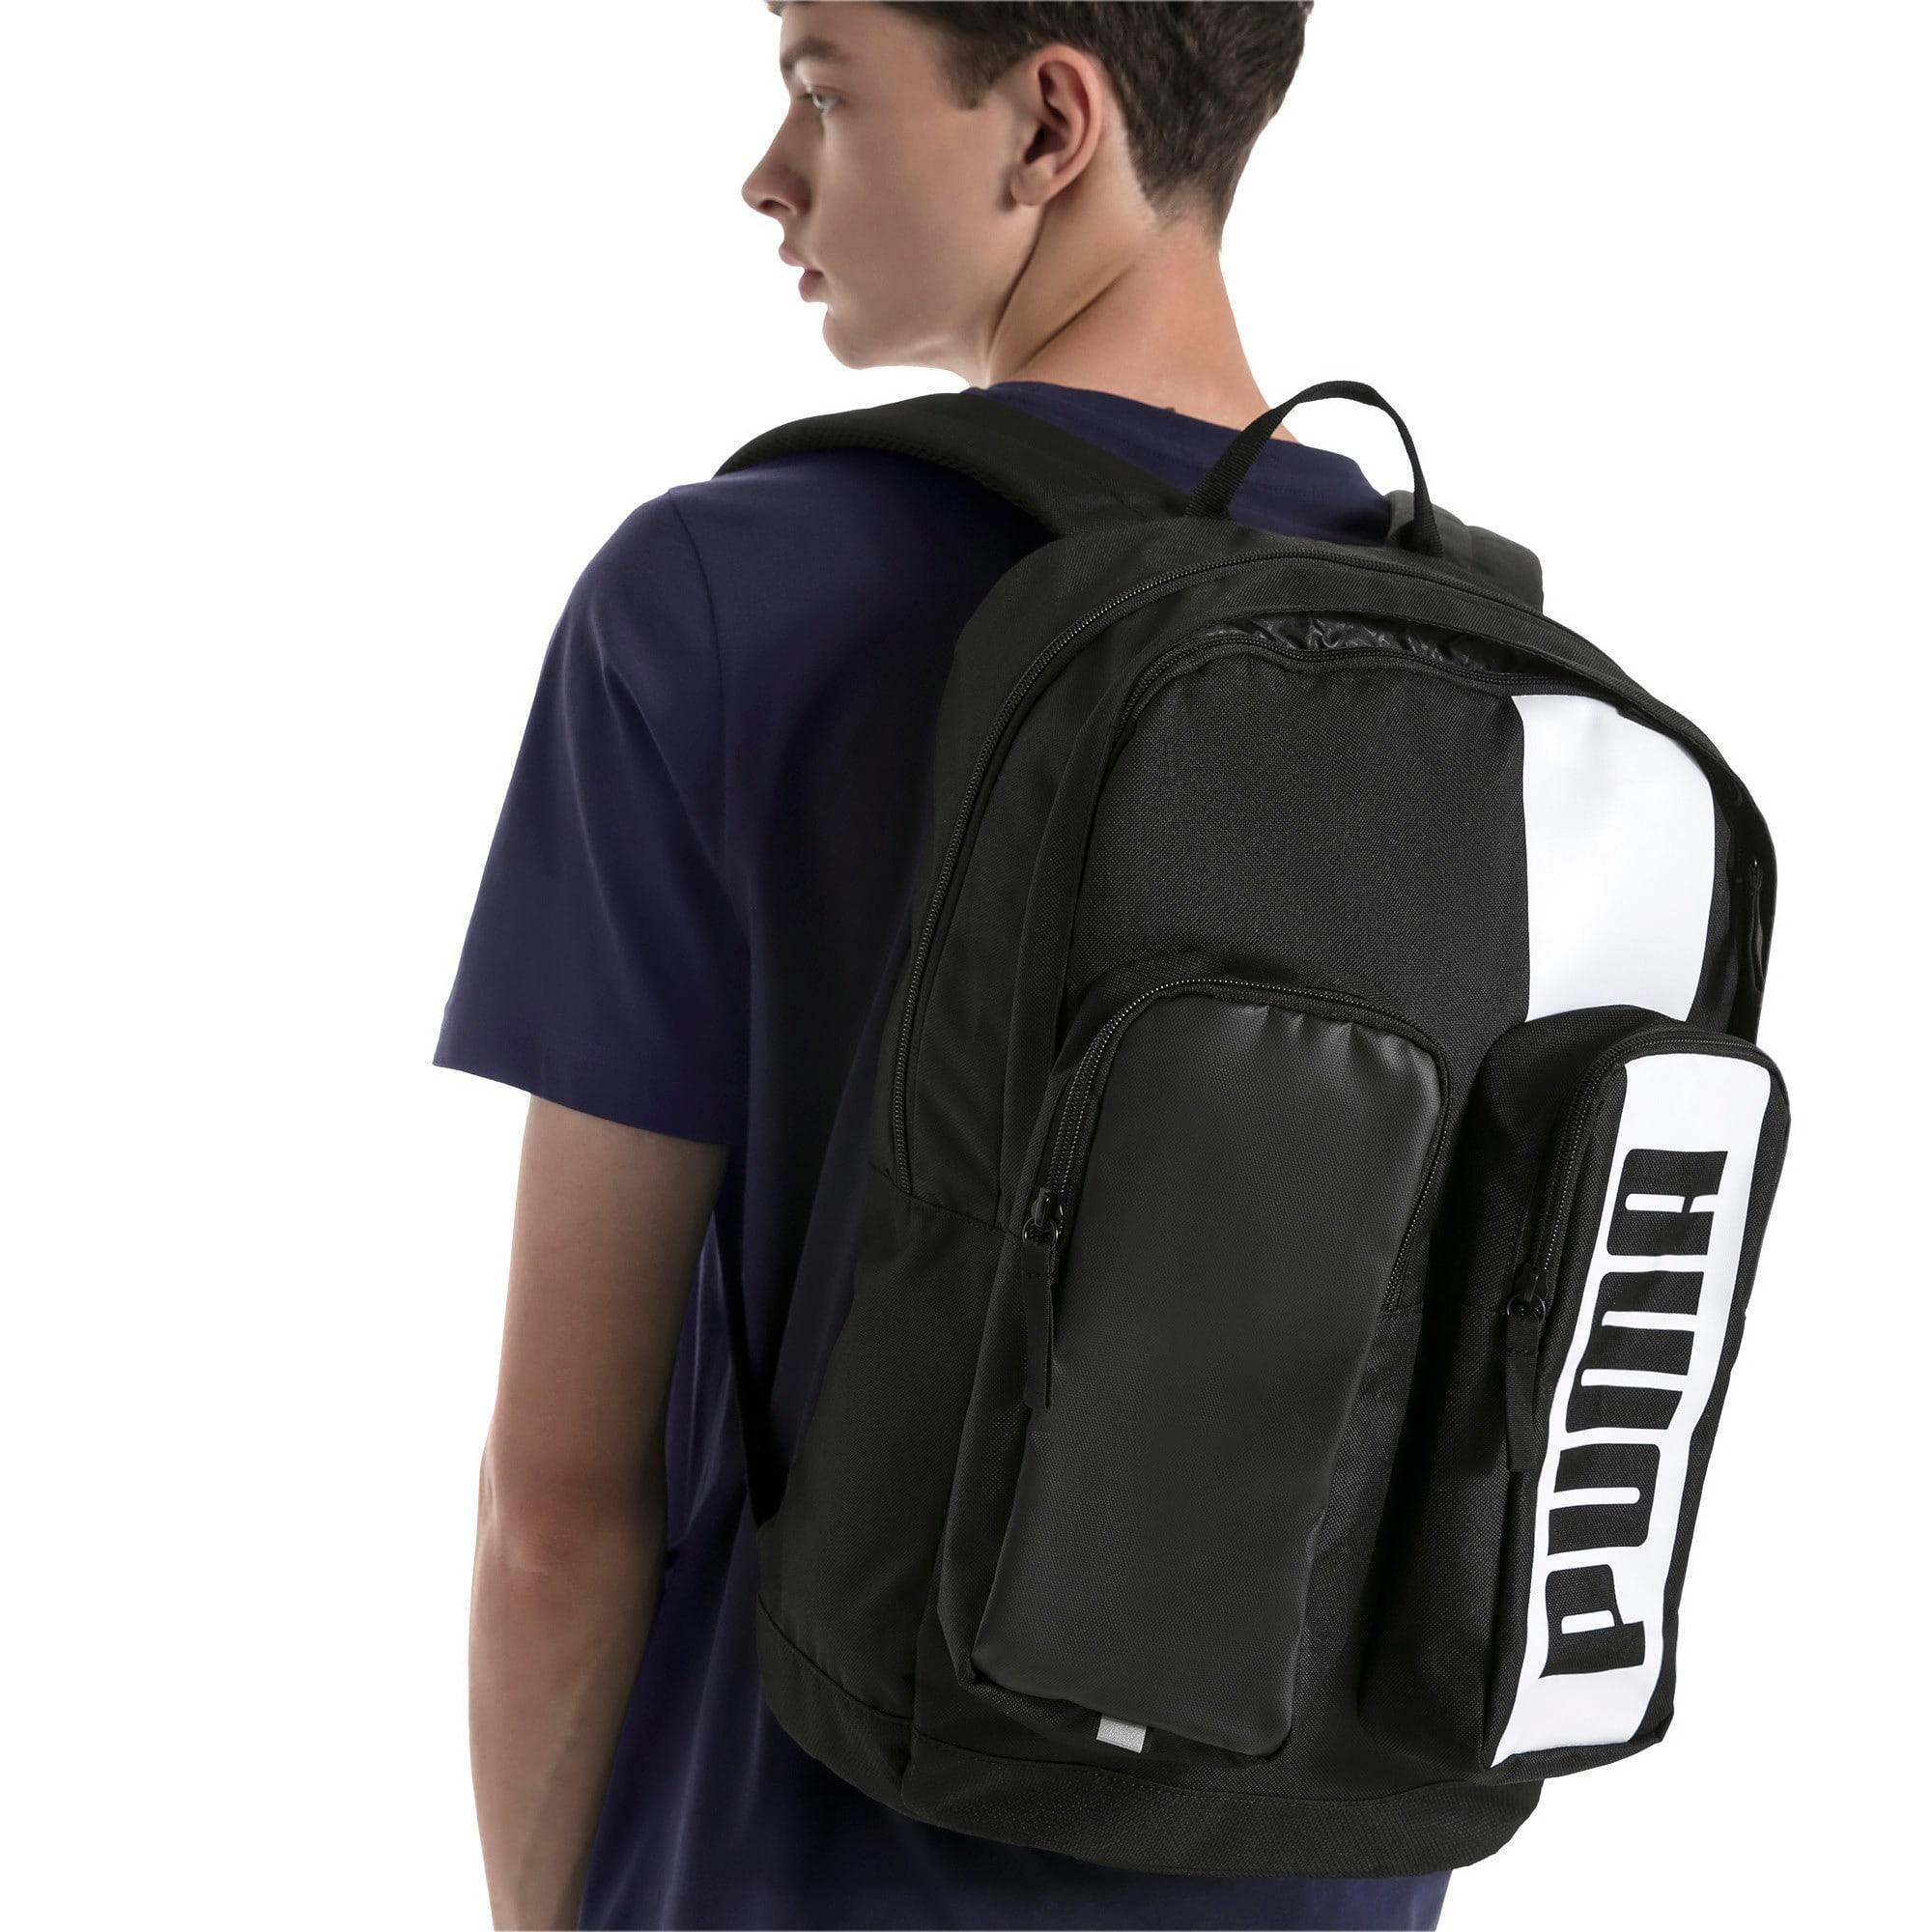 Thumbnail 2 of Deck Backpack II, Puma Black, medium-IND